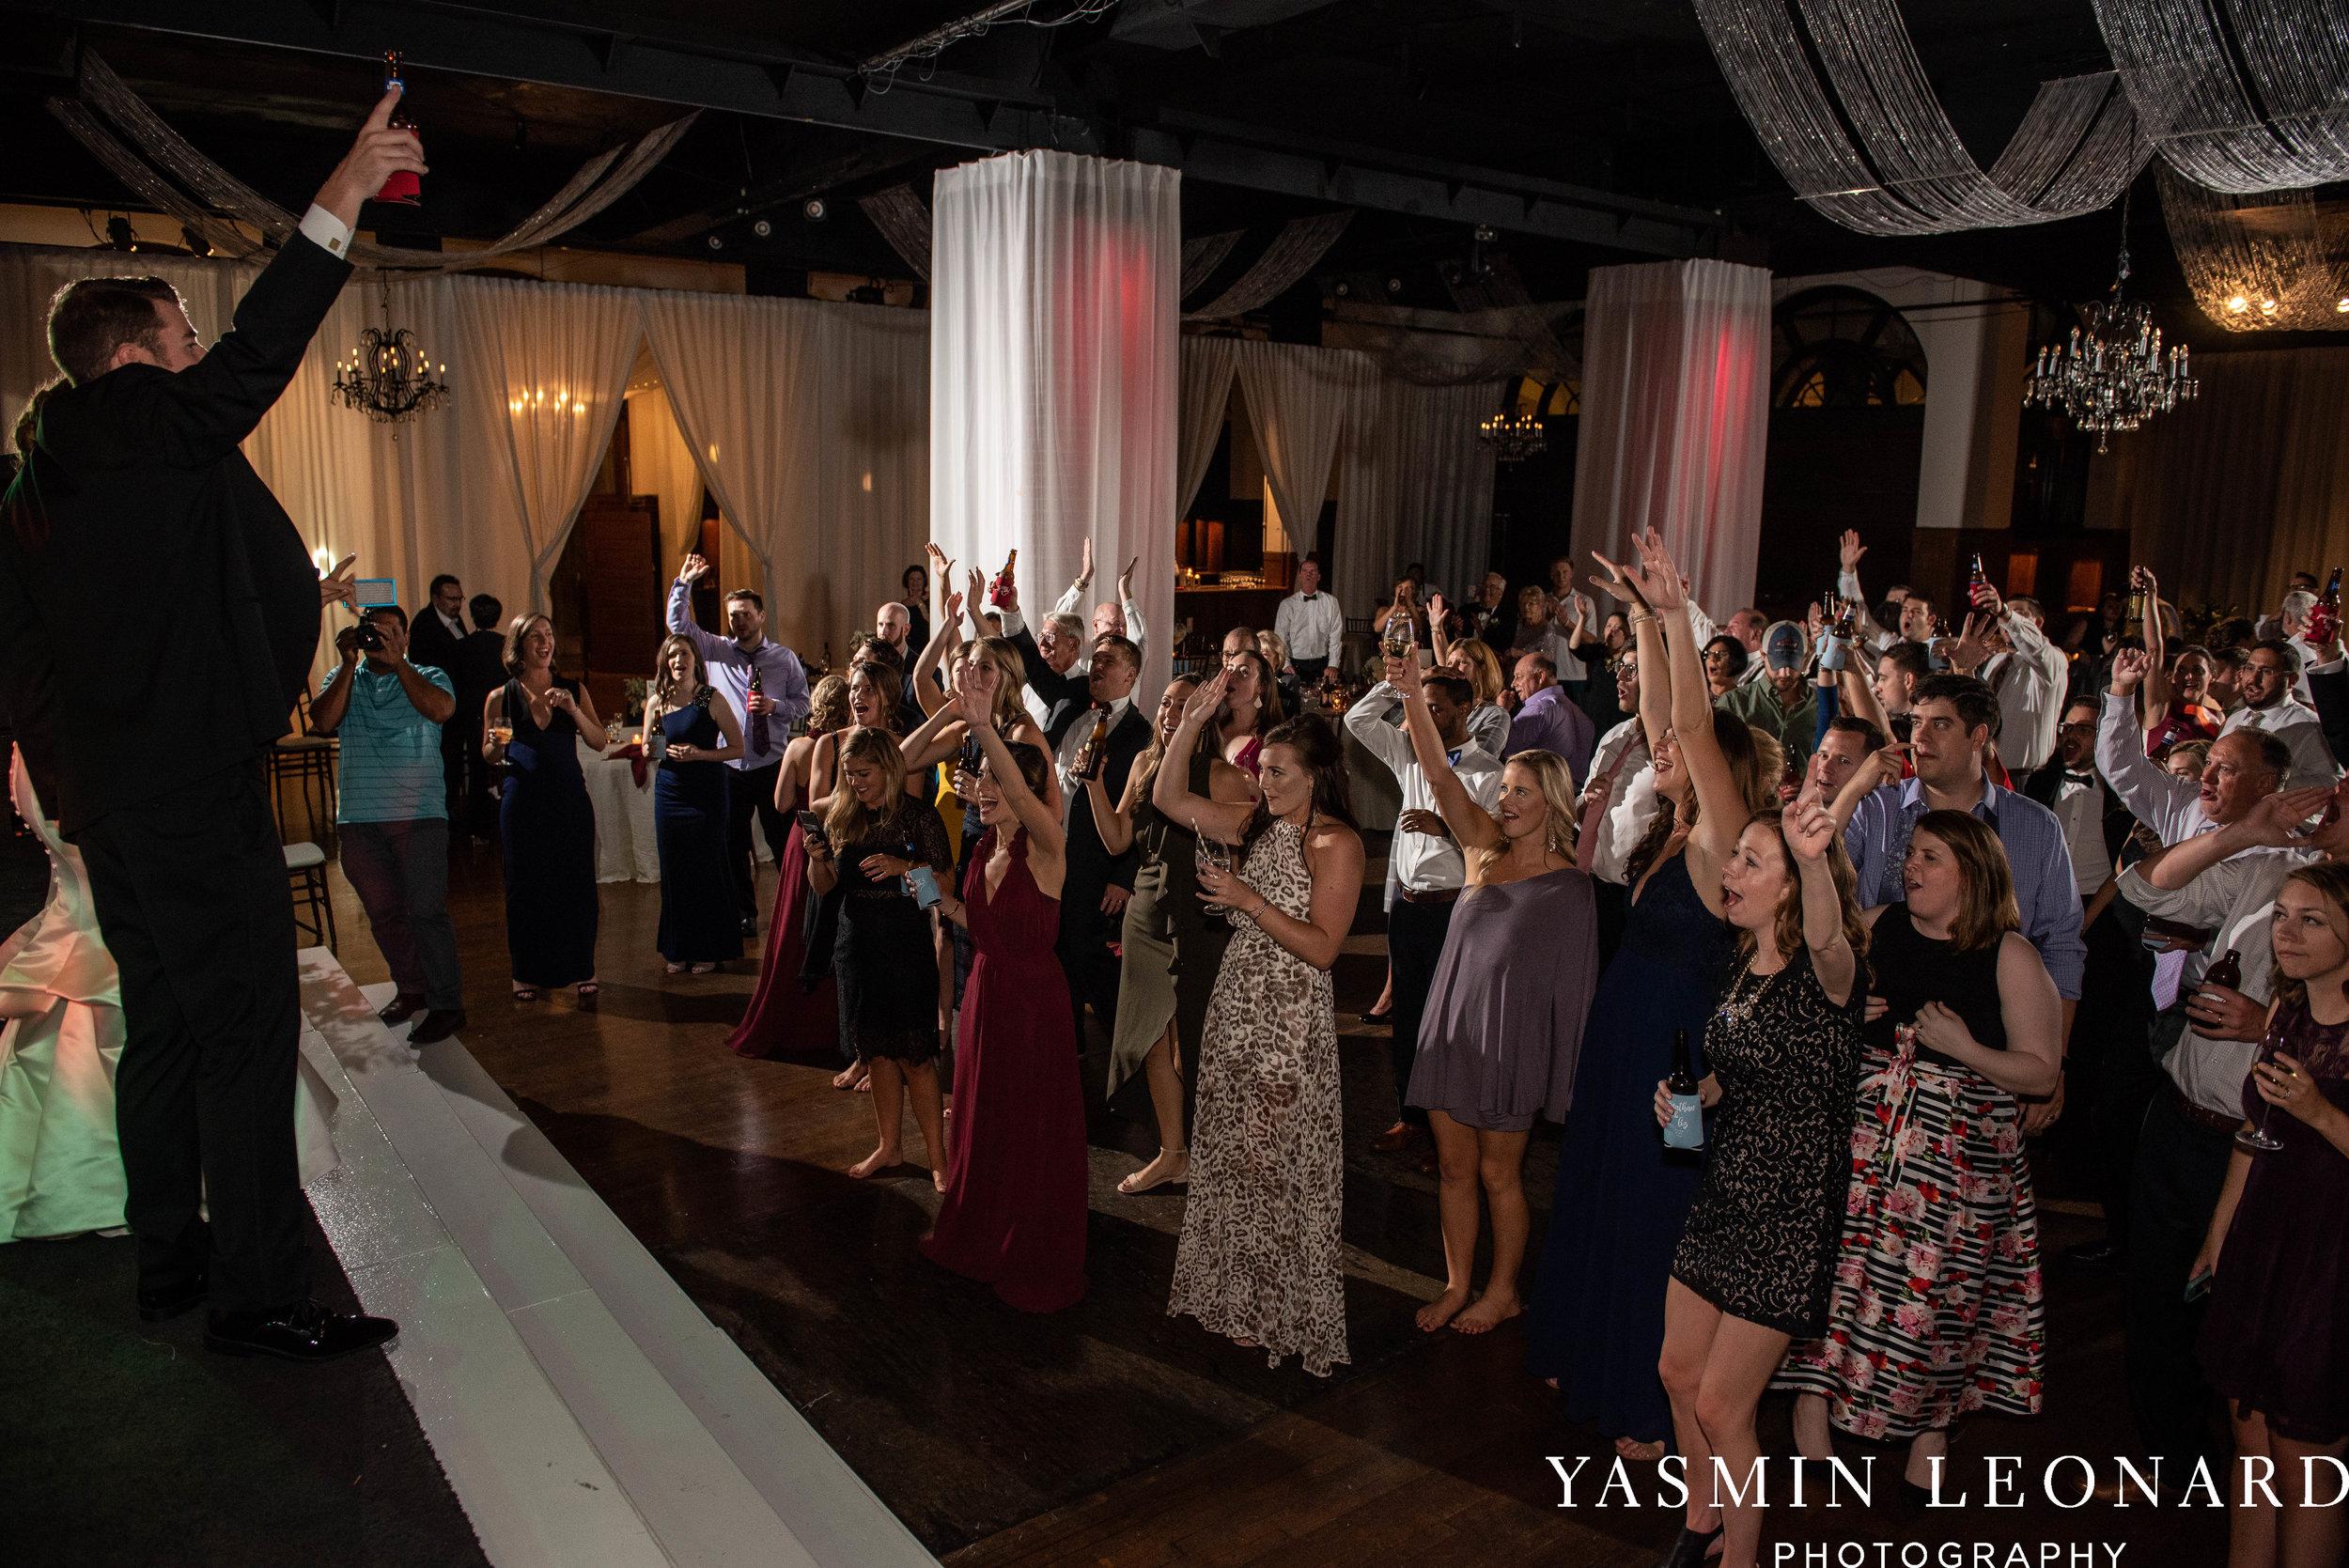 Millennium Center Wedding - Downtown Winston Salem - Winston Salem Wedding Photographer - Winston Salem Venues - Indoor Wedding Venues - NC Wedding Photographer - Yasmin Leonard Photography-83.jpg